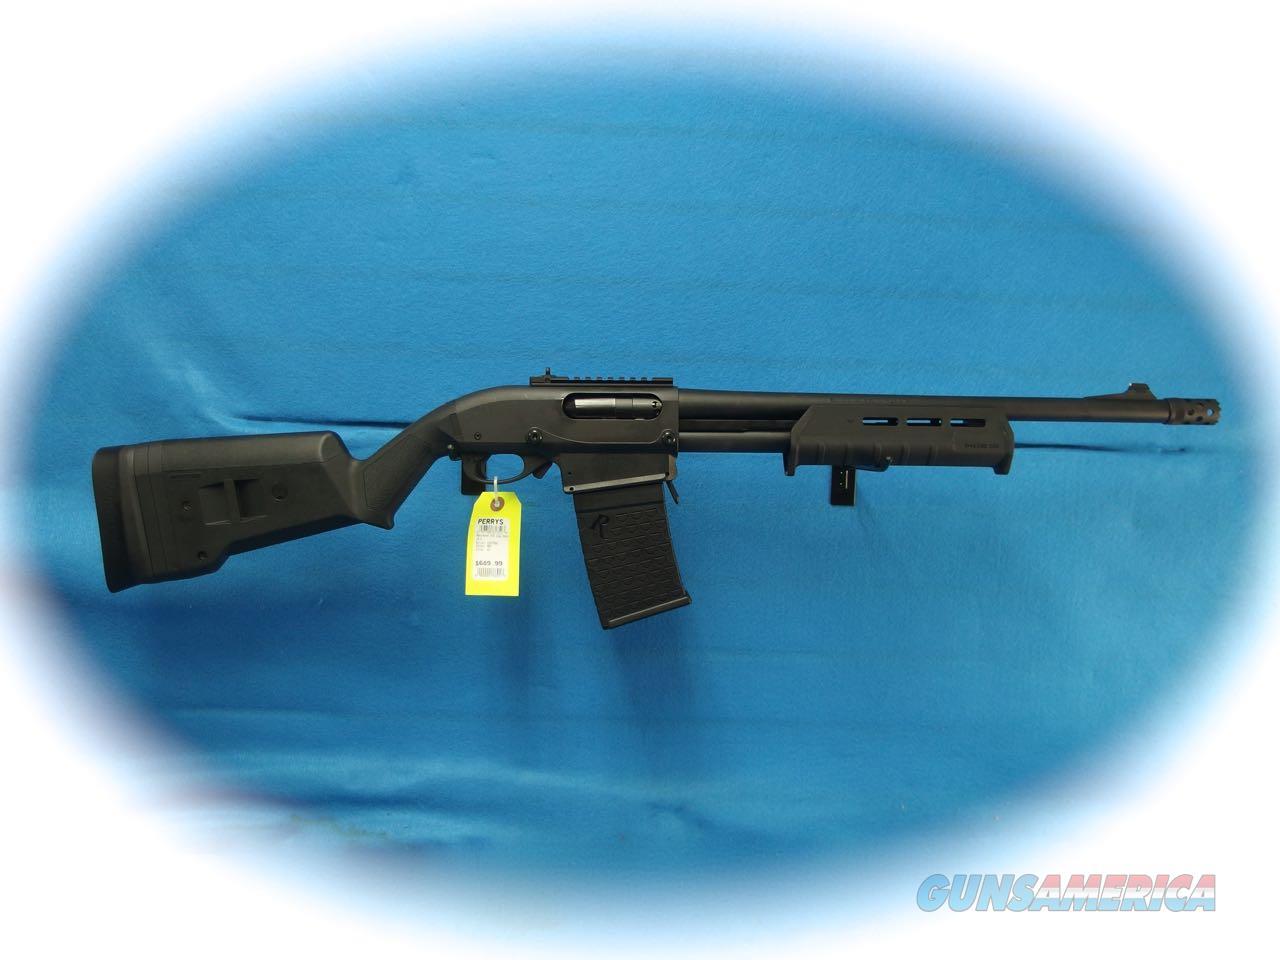 Remington 870 DM Pump 12 Ga. Shotgun Model 81352 **New**  Guns > Shotguns > Remington Shotguns  > Pump > Tactical